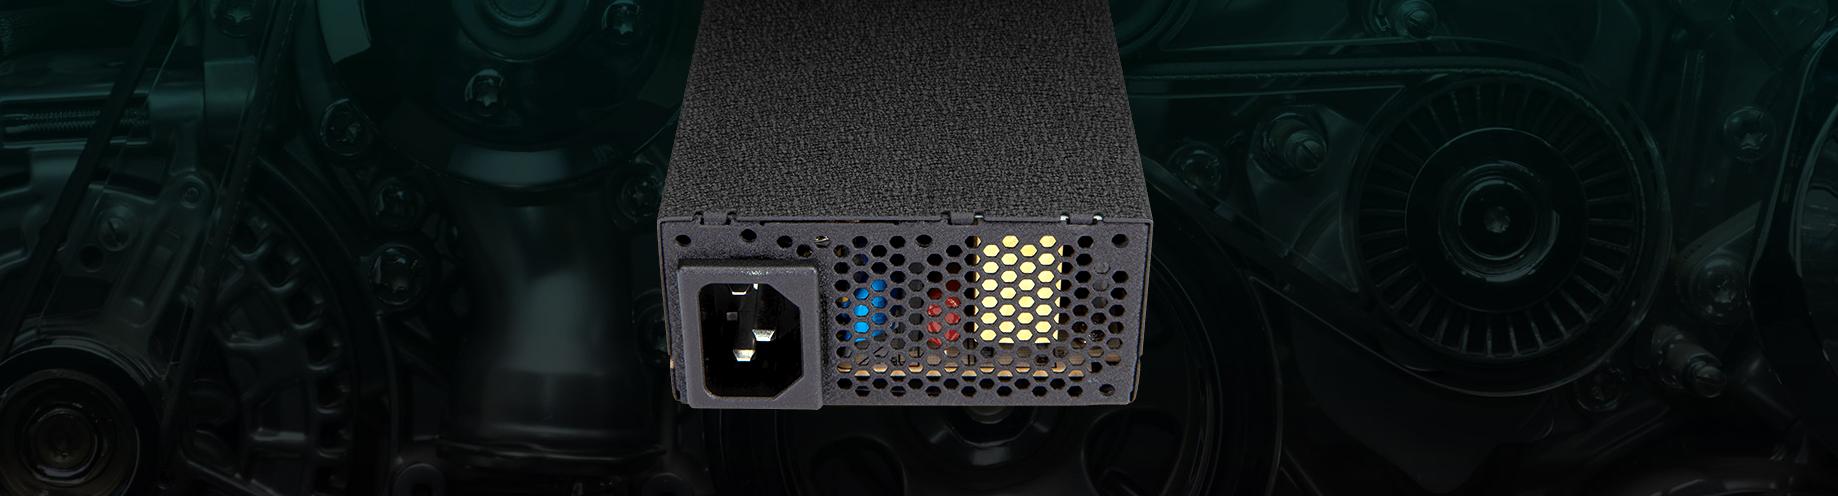 Nguồn FSP Power Supply FlexGURU Series Model FSP250-50FGBBI Active PFC (80 Plus /Flex ATX/Màu Đen) giới thiệu 6